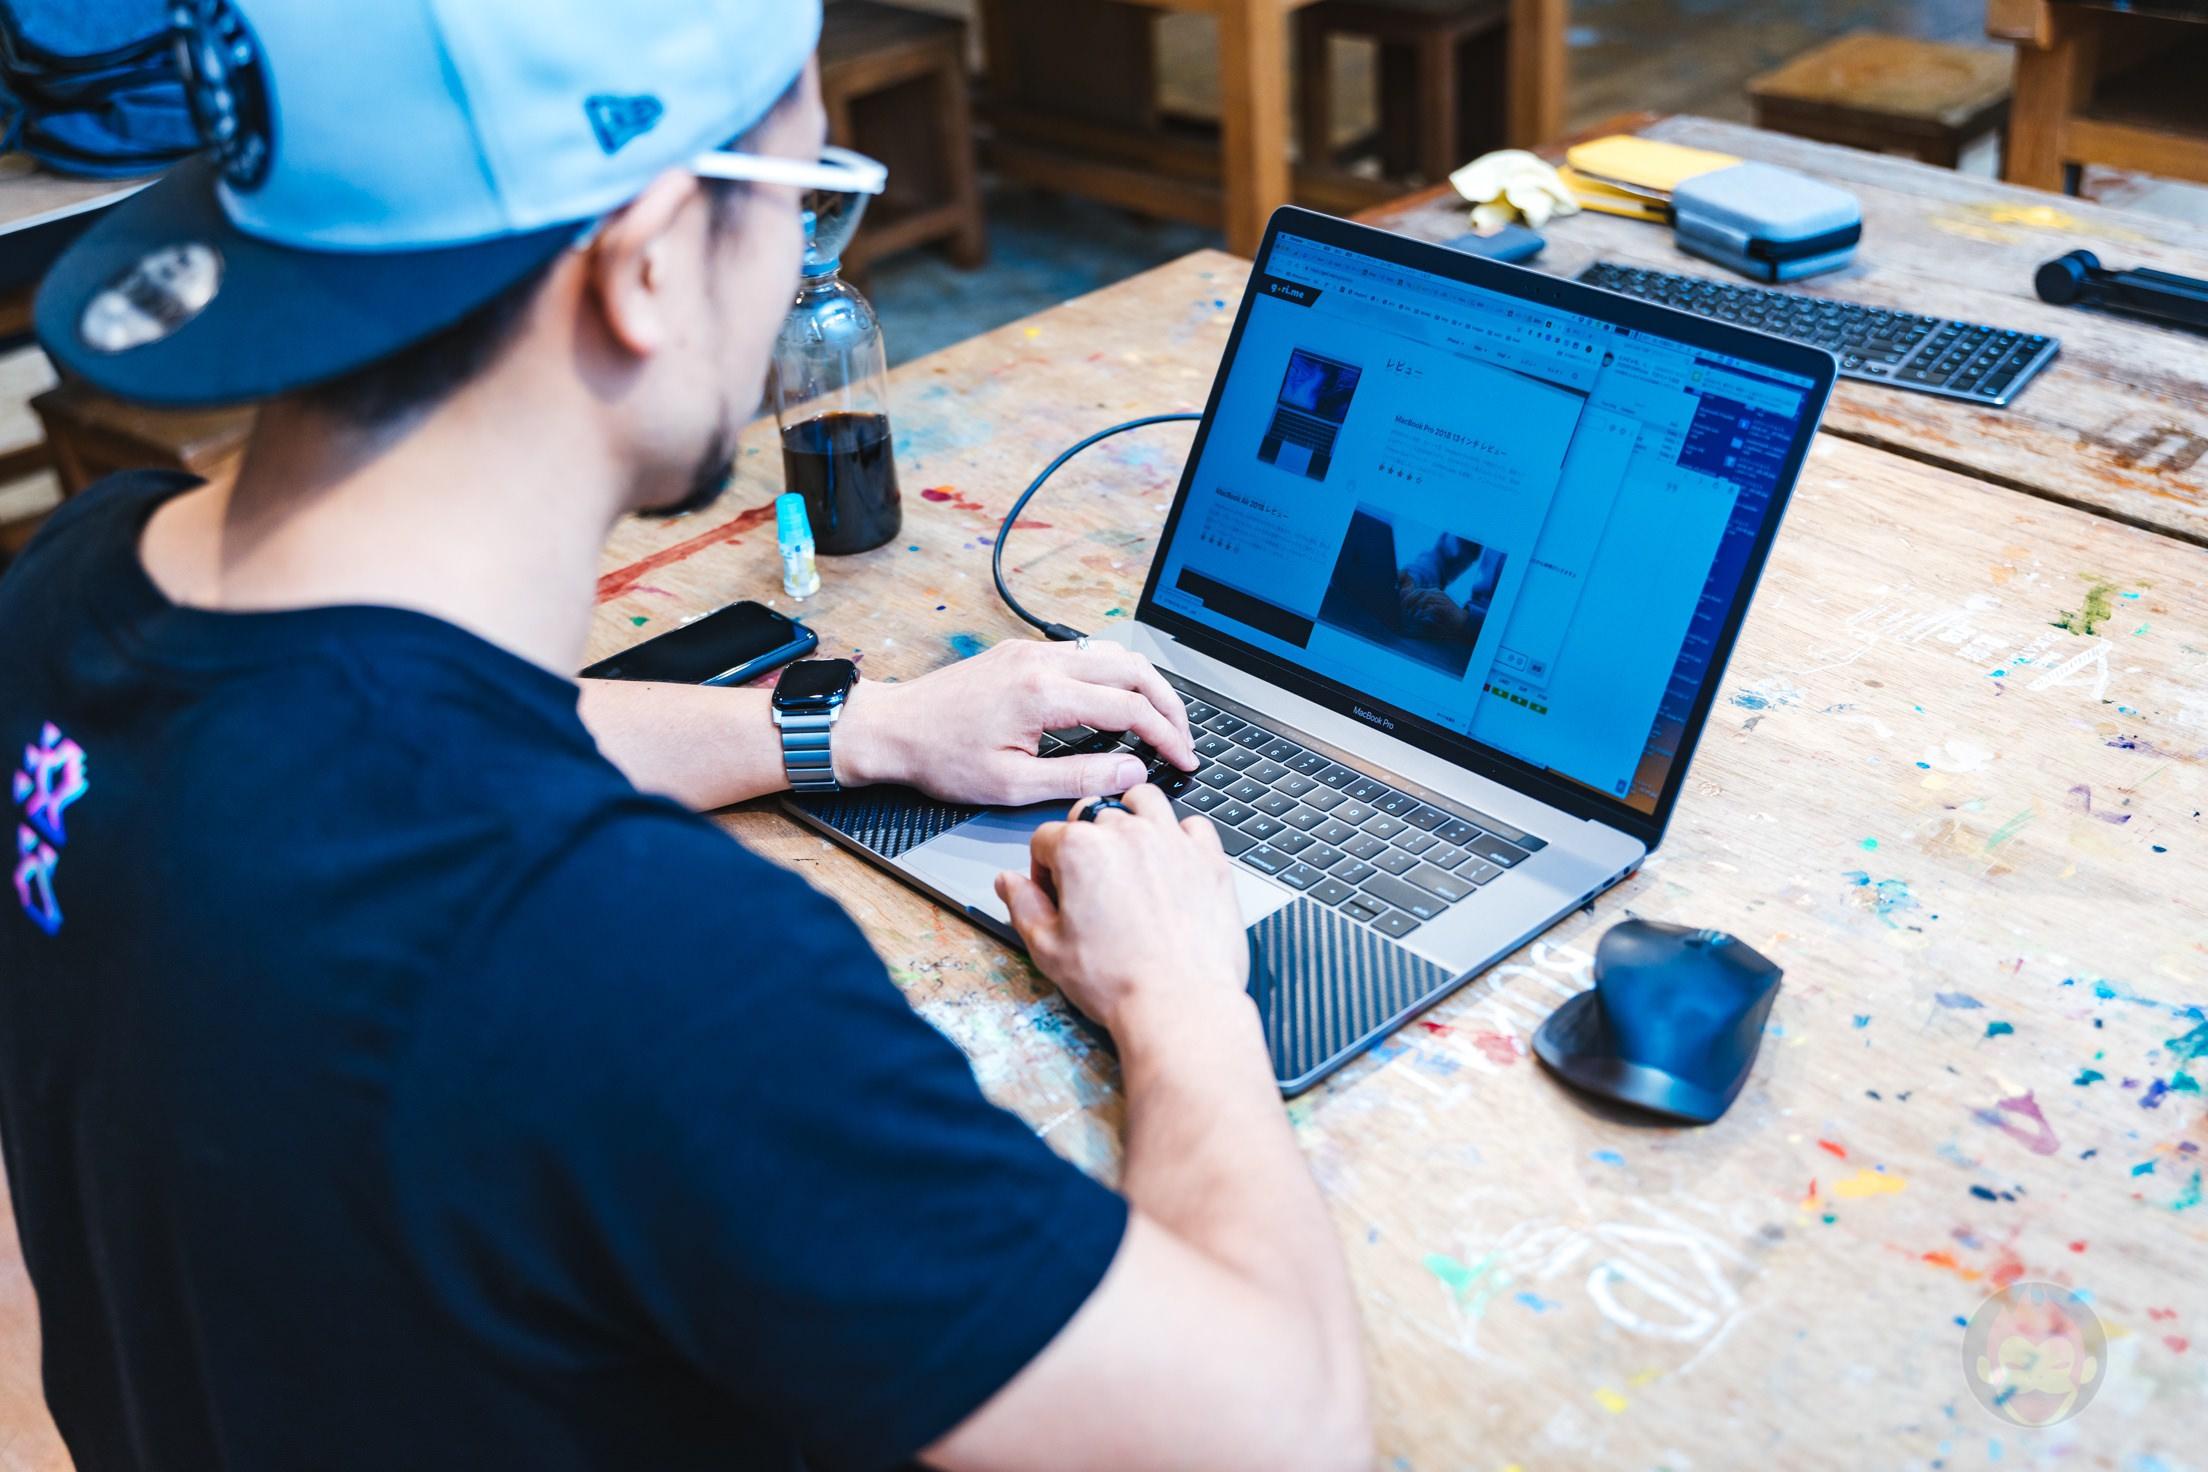 MacBook-Pro-2019-15inch-review-22.jpg